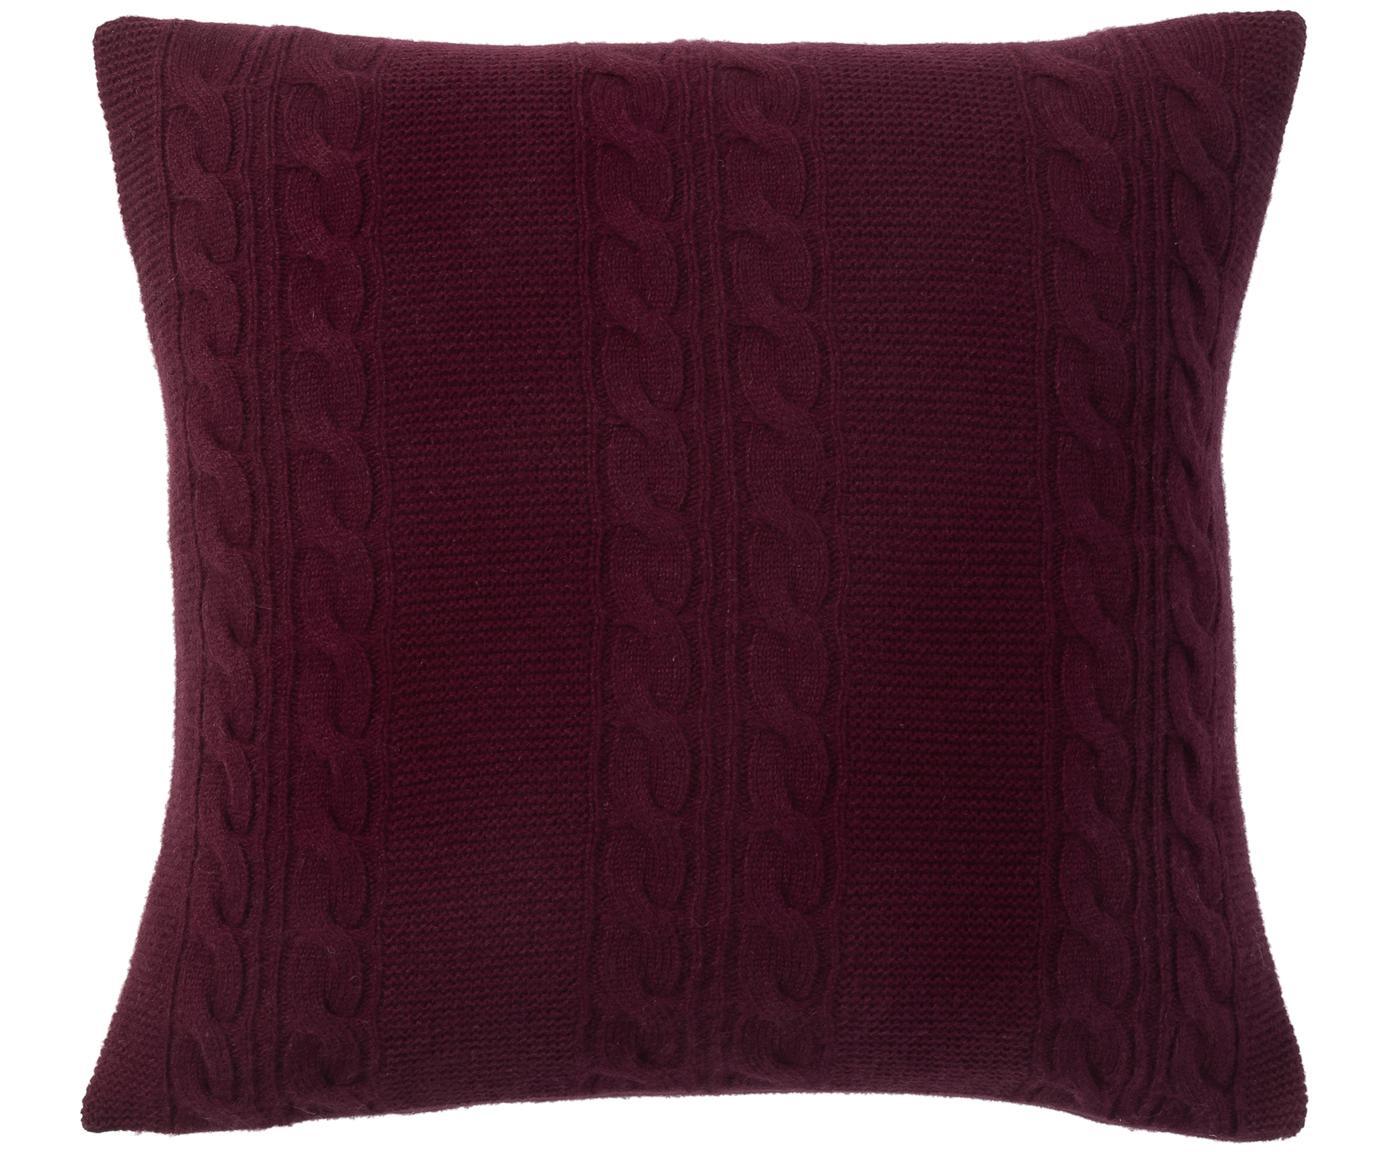 Funda de cojín de cachemira pura Leonie, 100%cachemira La cachemira es un tejido muy suave, cómodo y cálido, Rojo oscuro, An 40 x L 40 cm